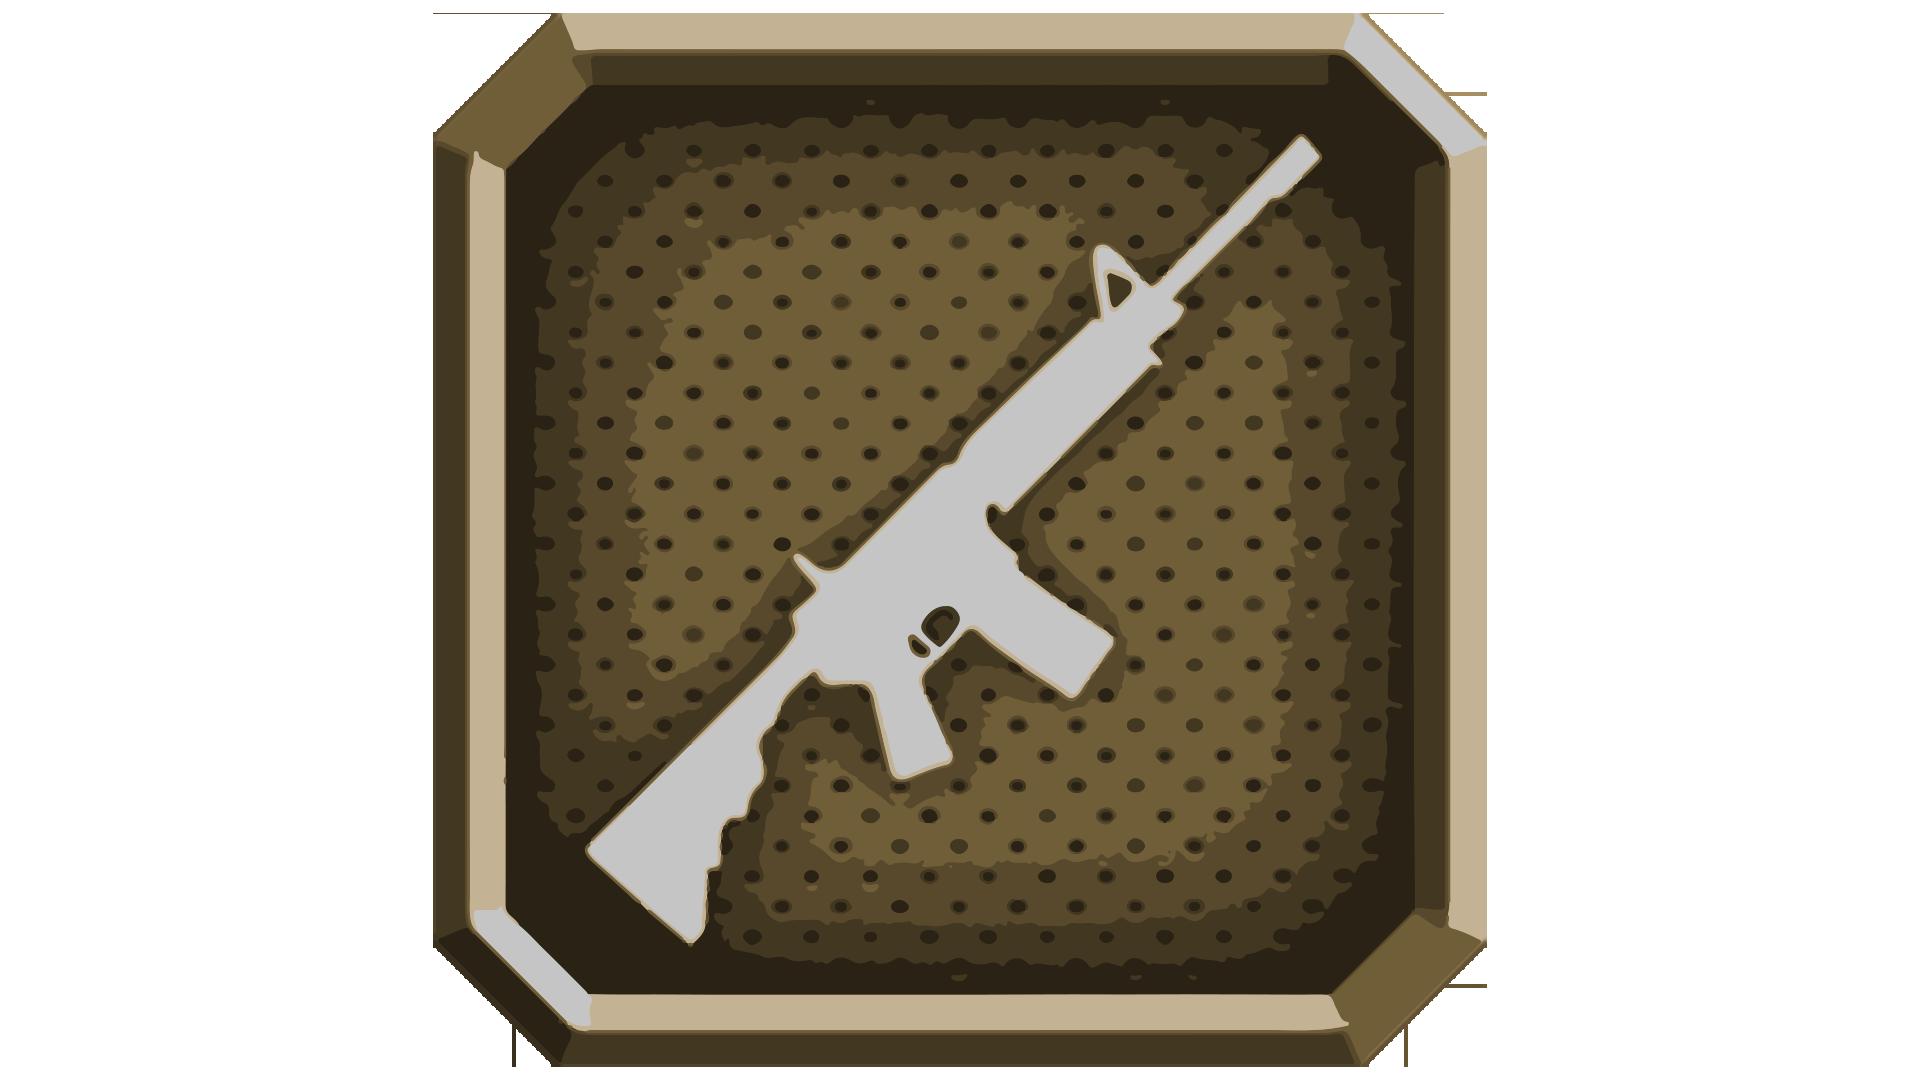 M4 Slayer achievement for Dead Alliance on Xbox One